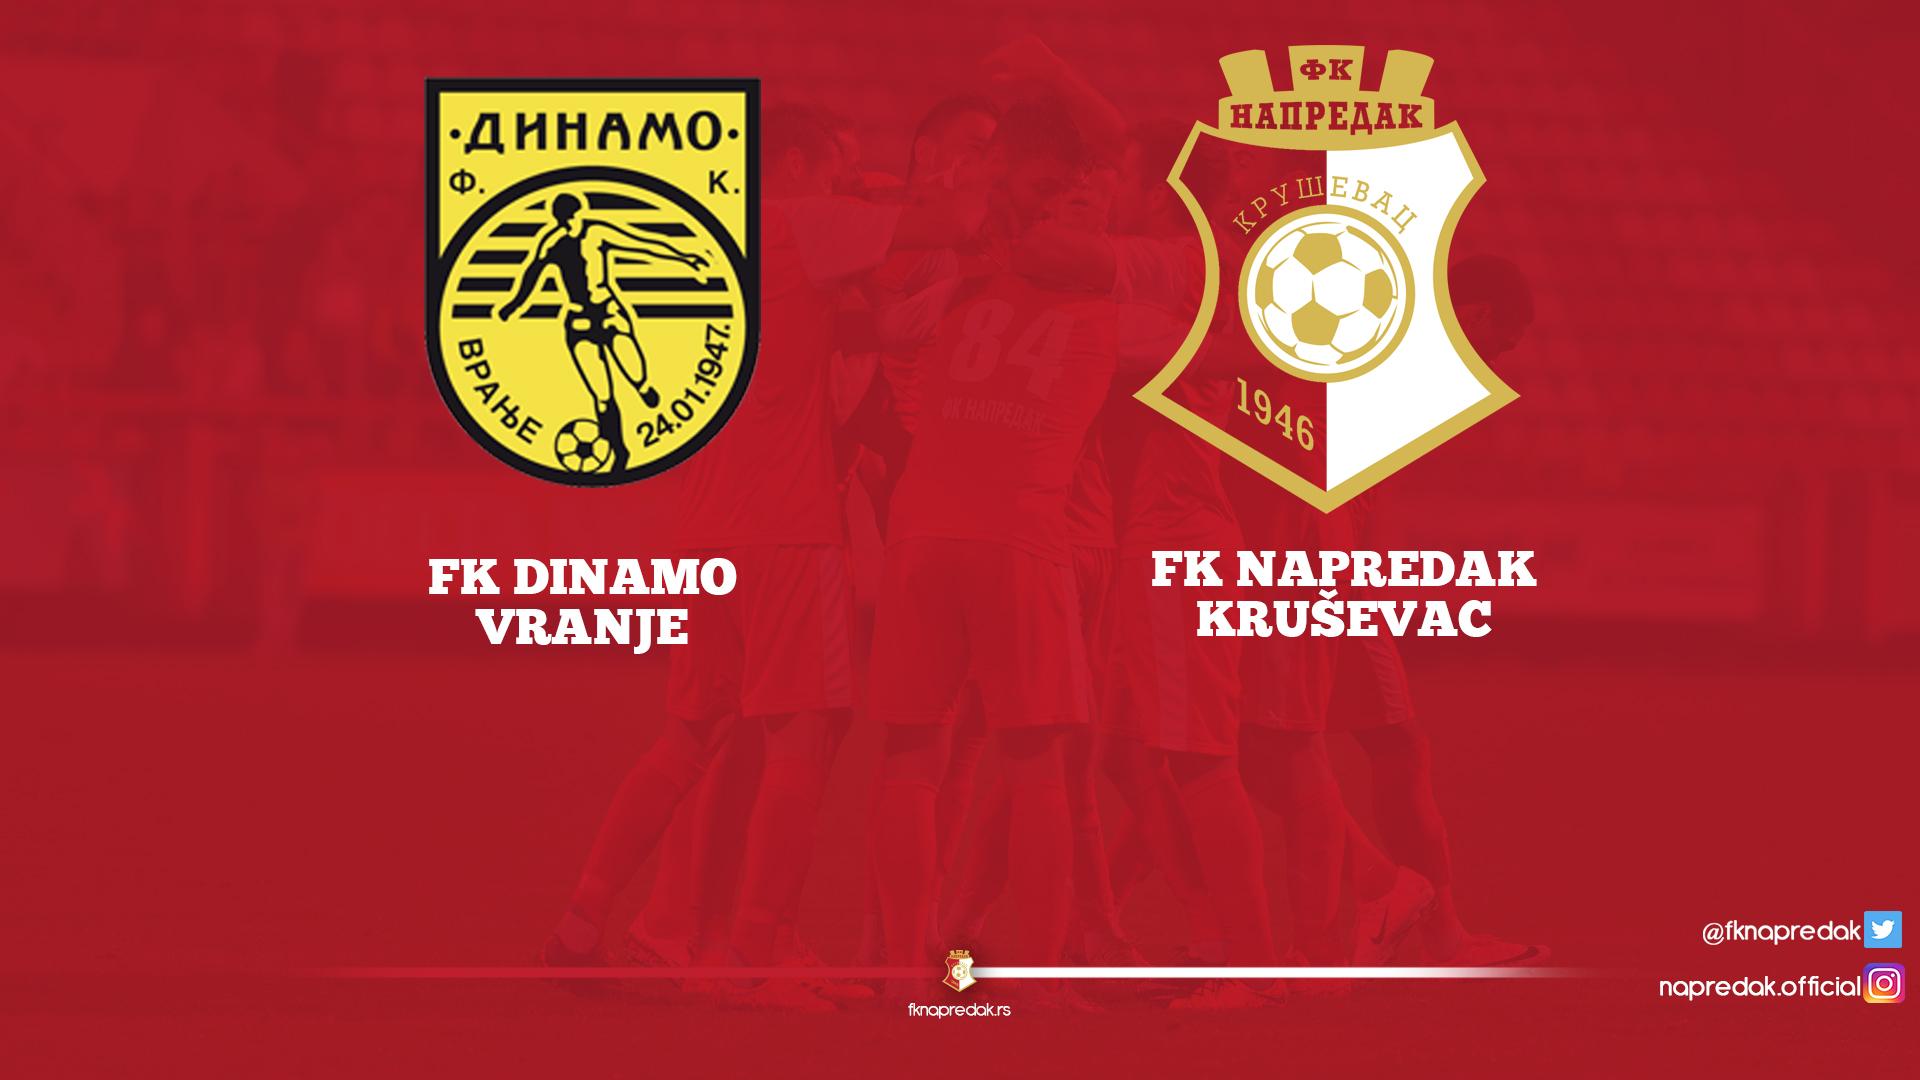 Dinamo F.C. - Napredak F.C. 4:0